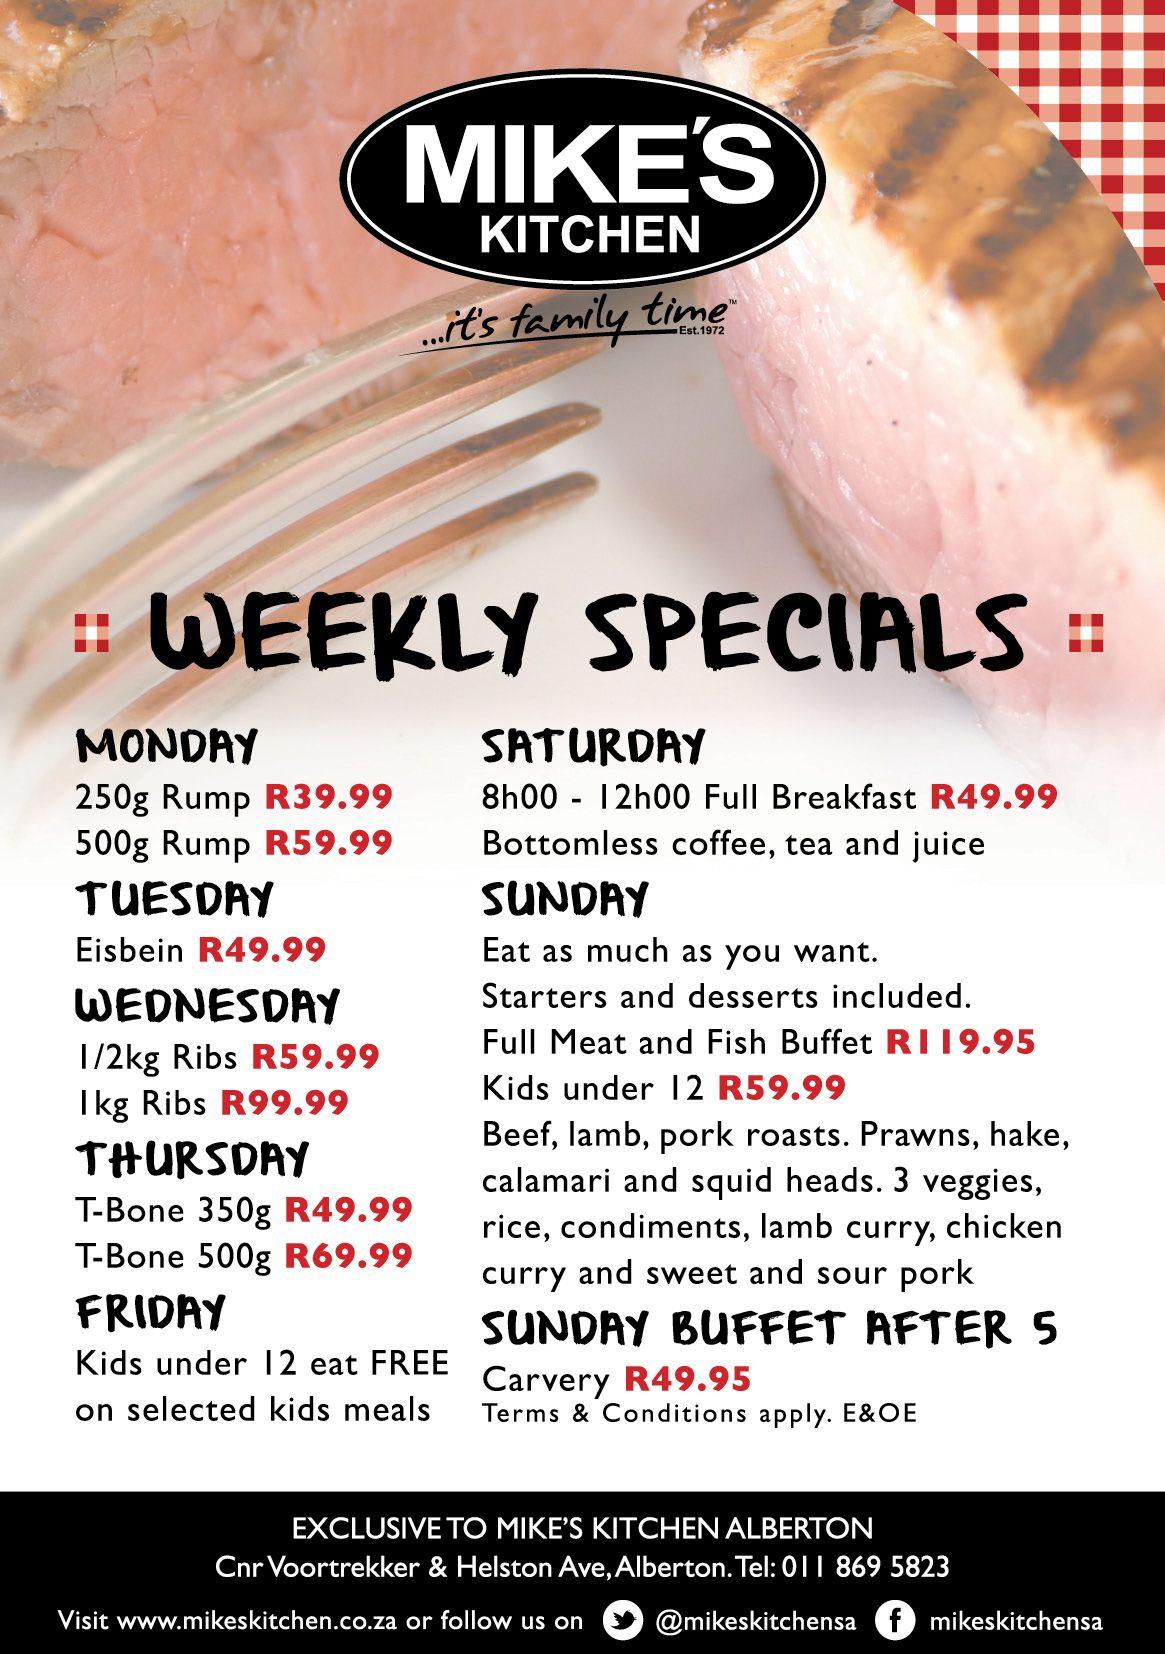 Mike\'s Kitchen Alberton Weekly Specials | Mike\'s Kitchen Alberton ...